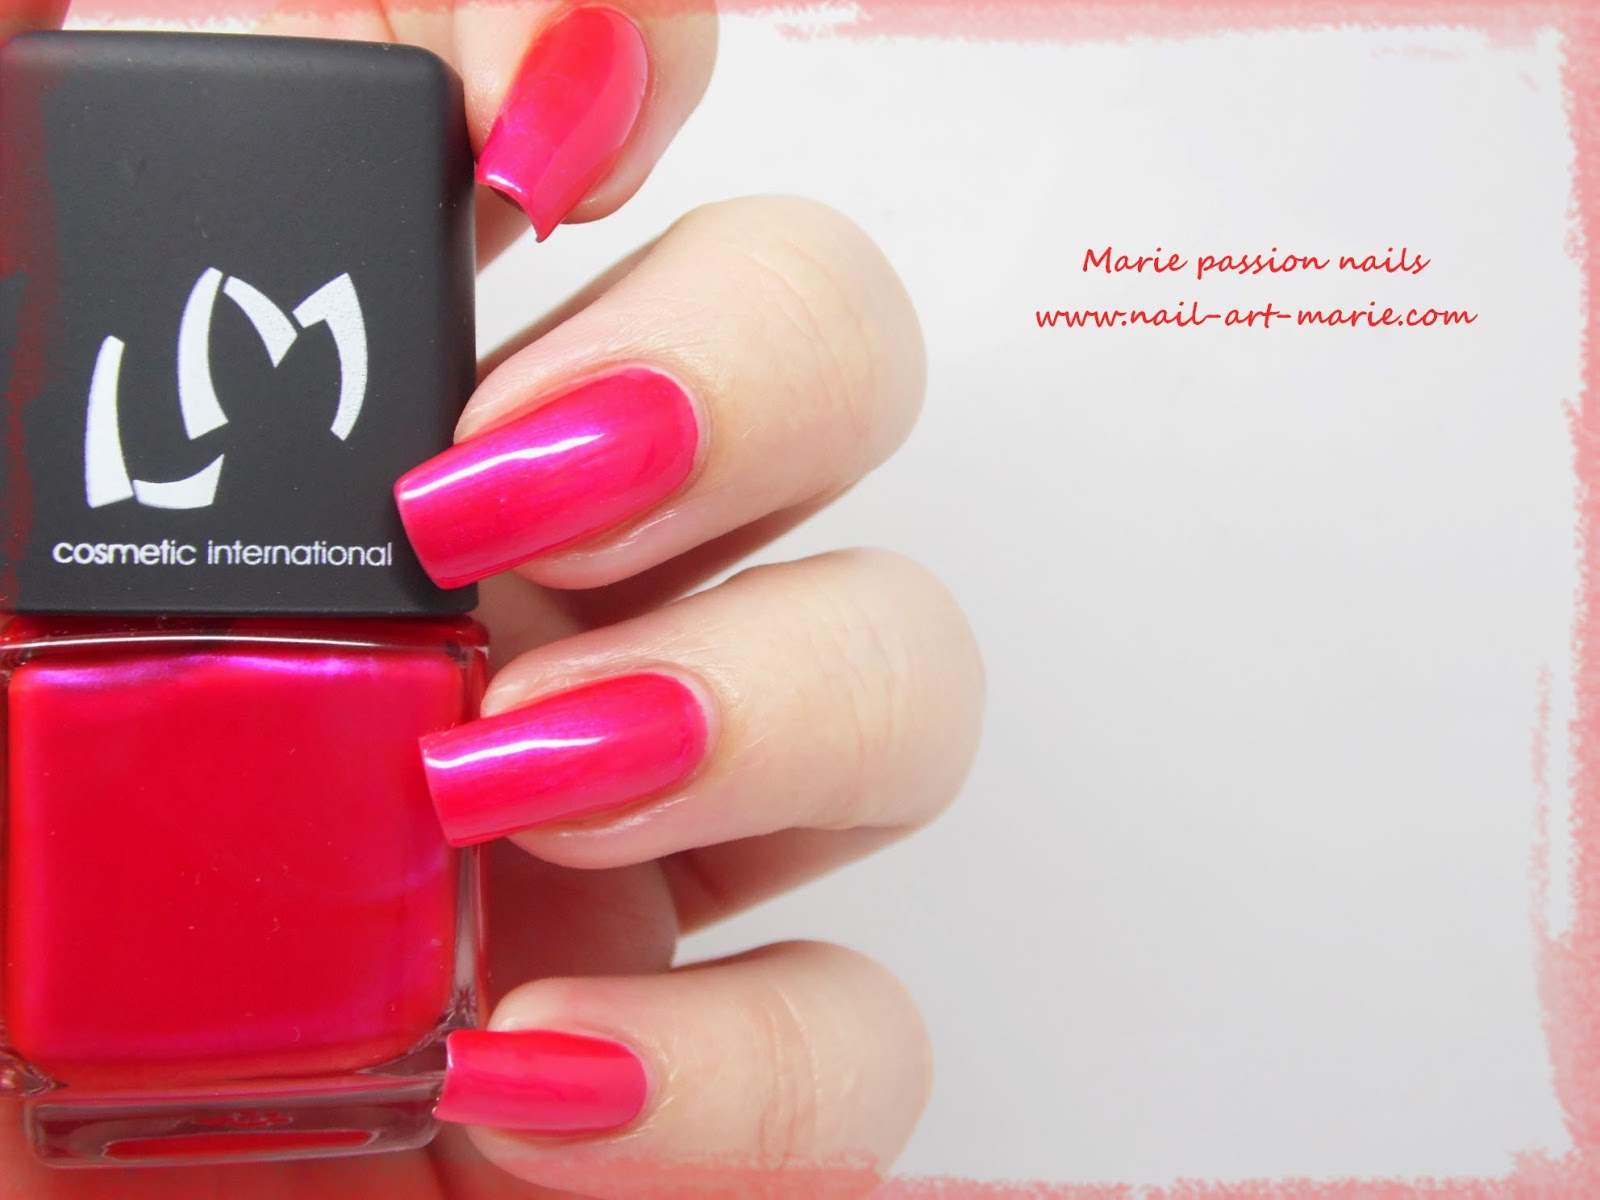 LM Cosmetic Maracana3